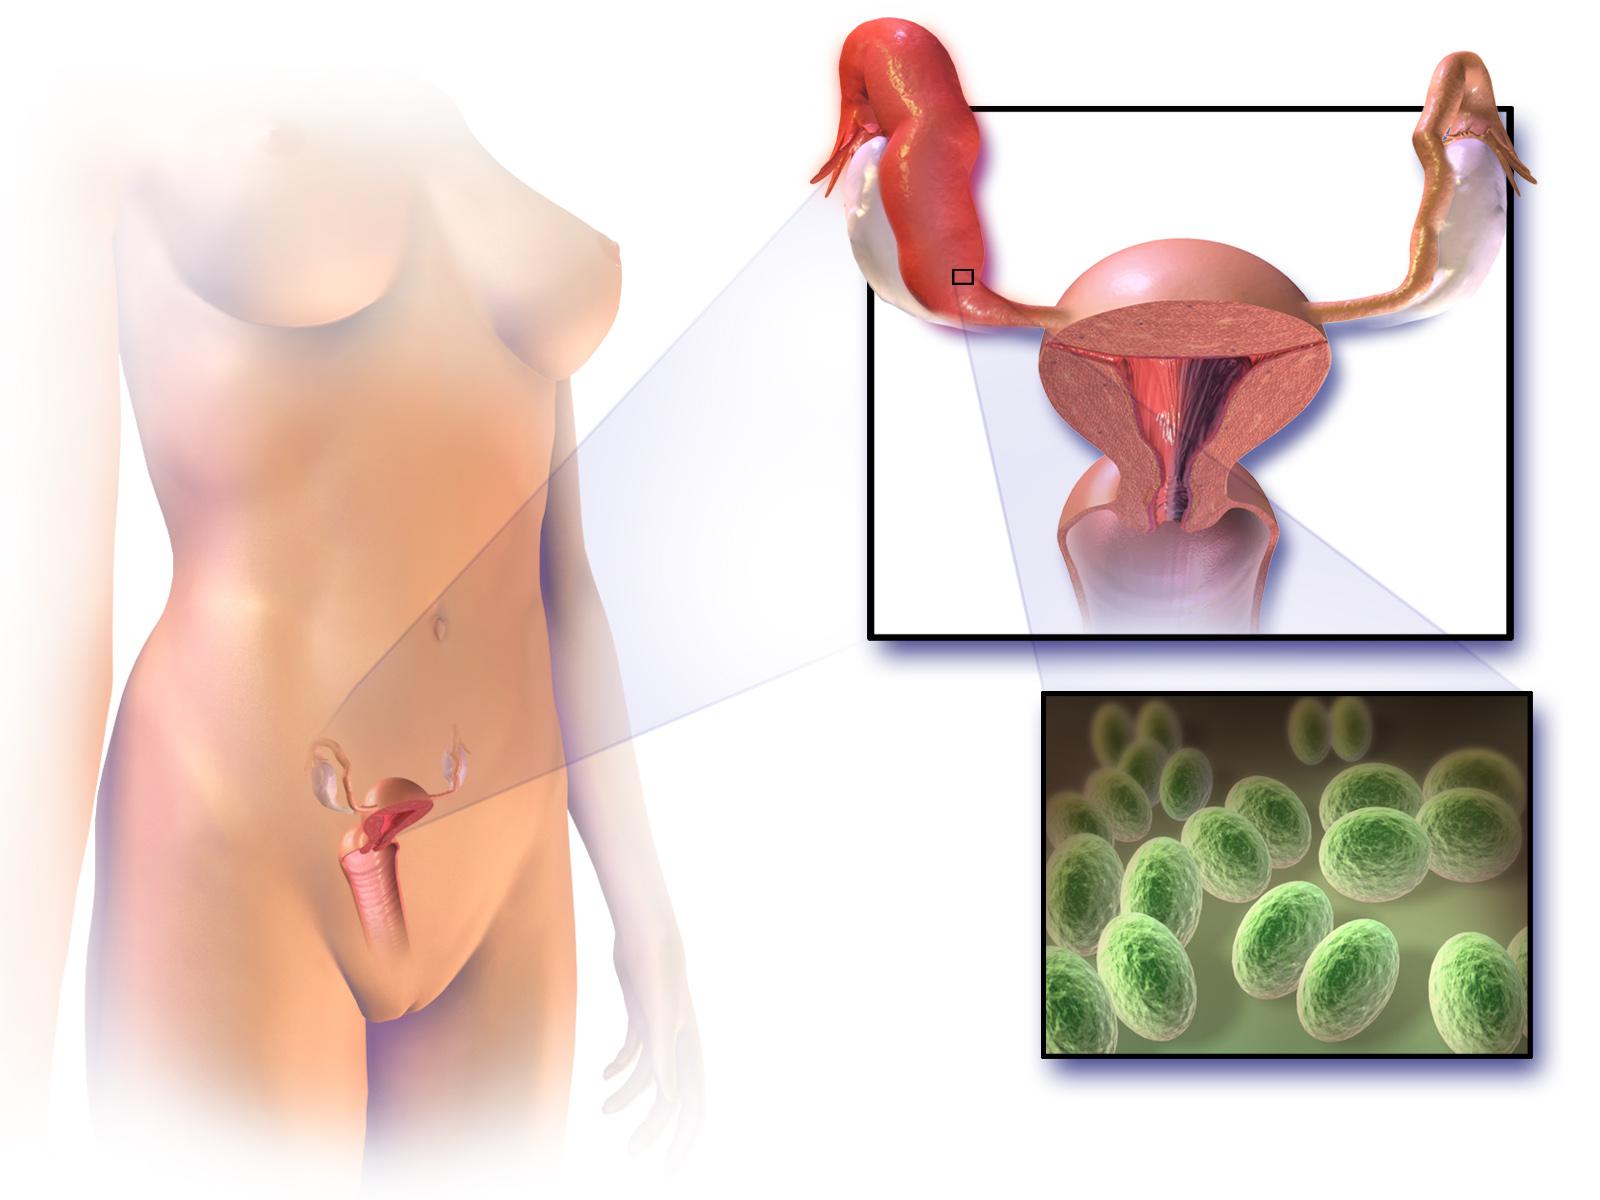 Применение препарата «жанин» при миоме матки